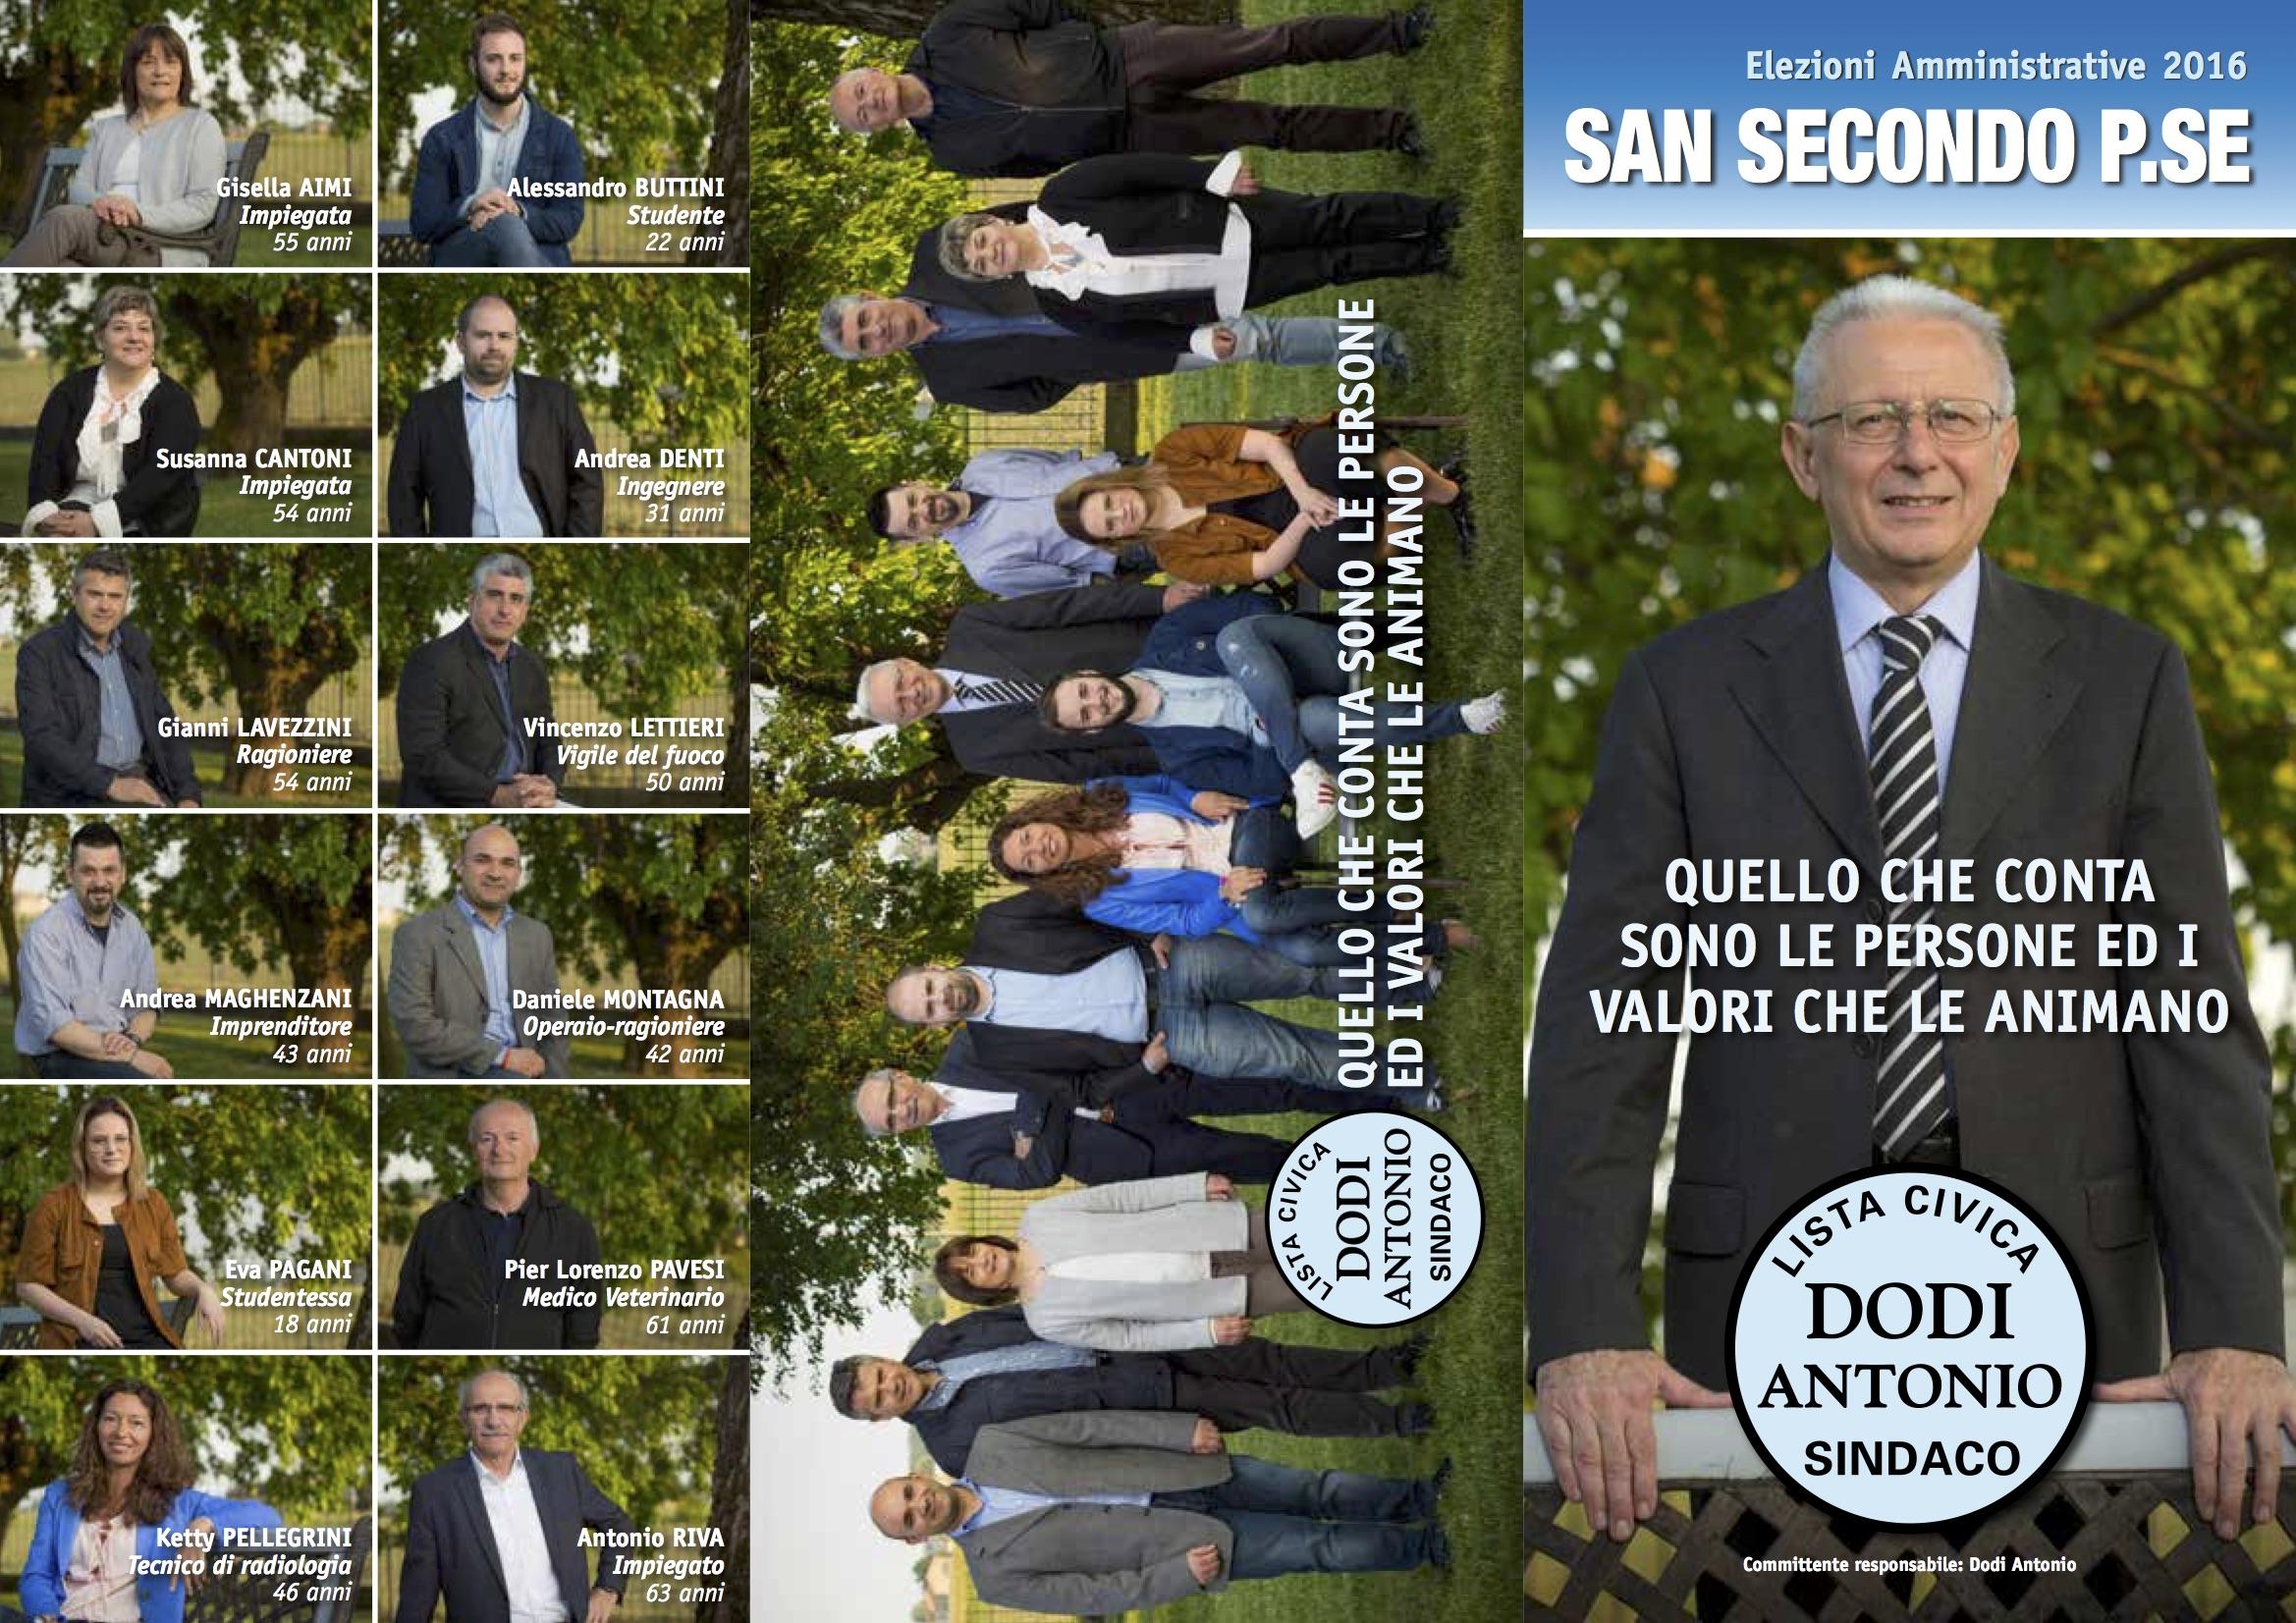 PIEGHEVOLE - DODI SINDACO(1)